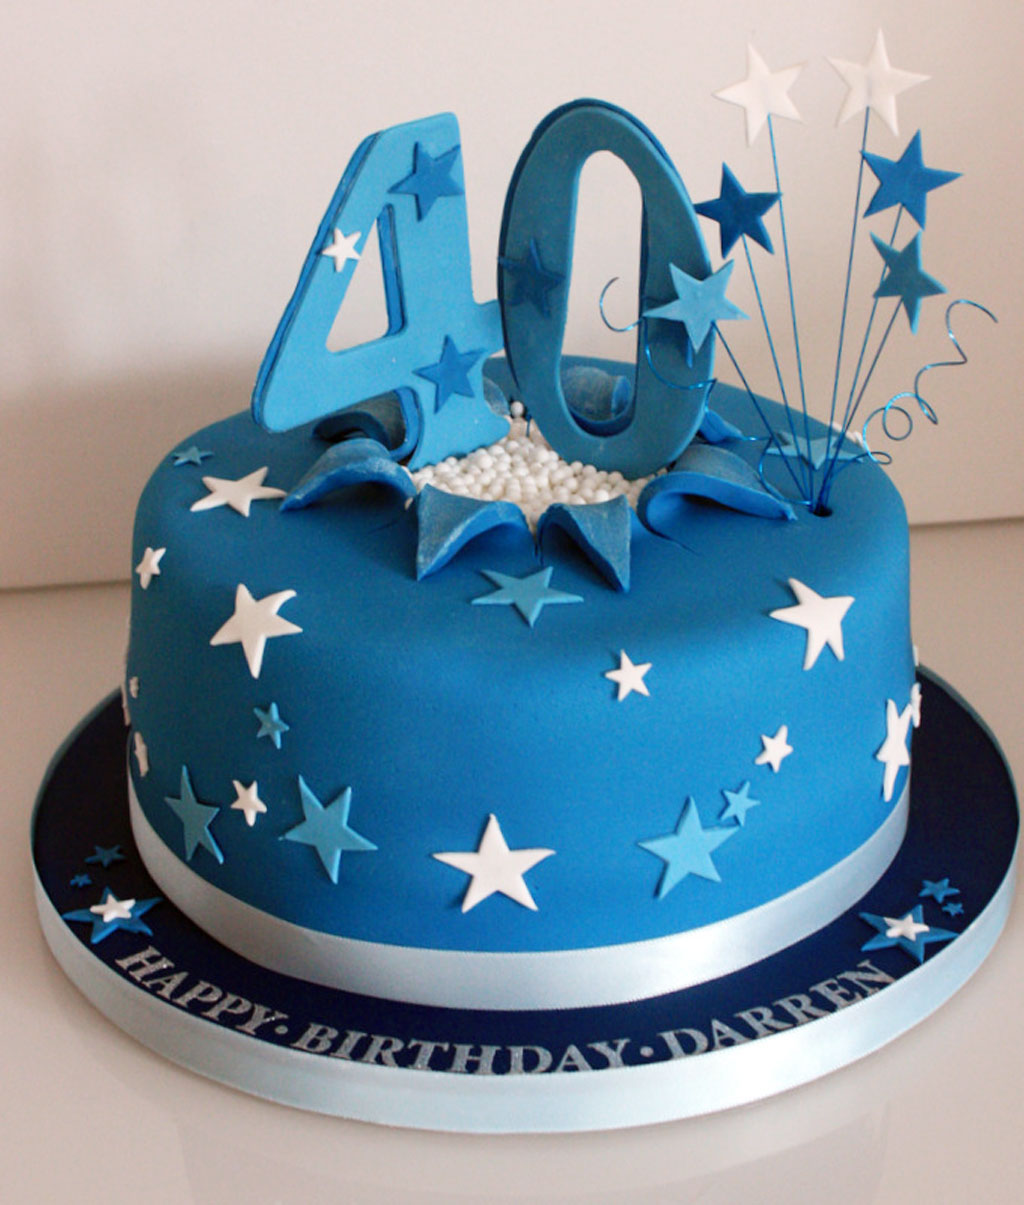 40th Birthday Cake Composite Replacement Windows Magazine Printing